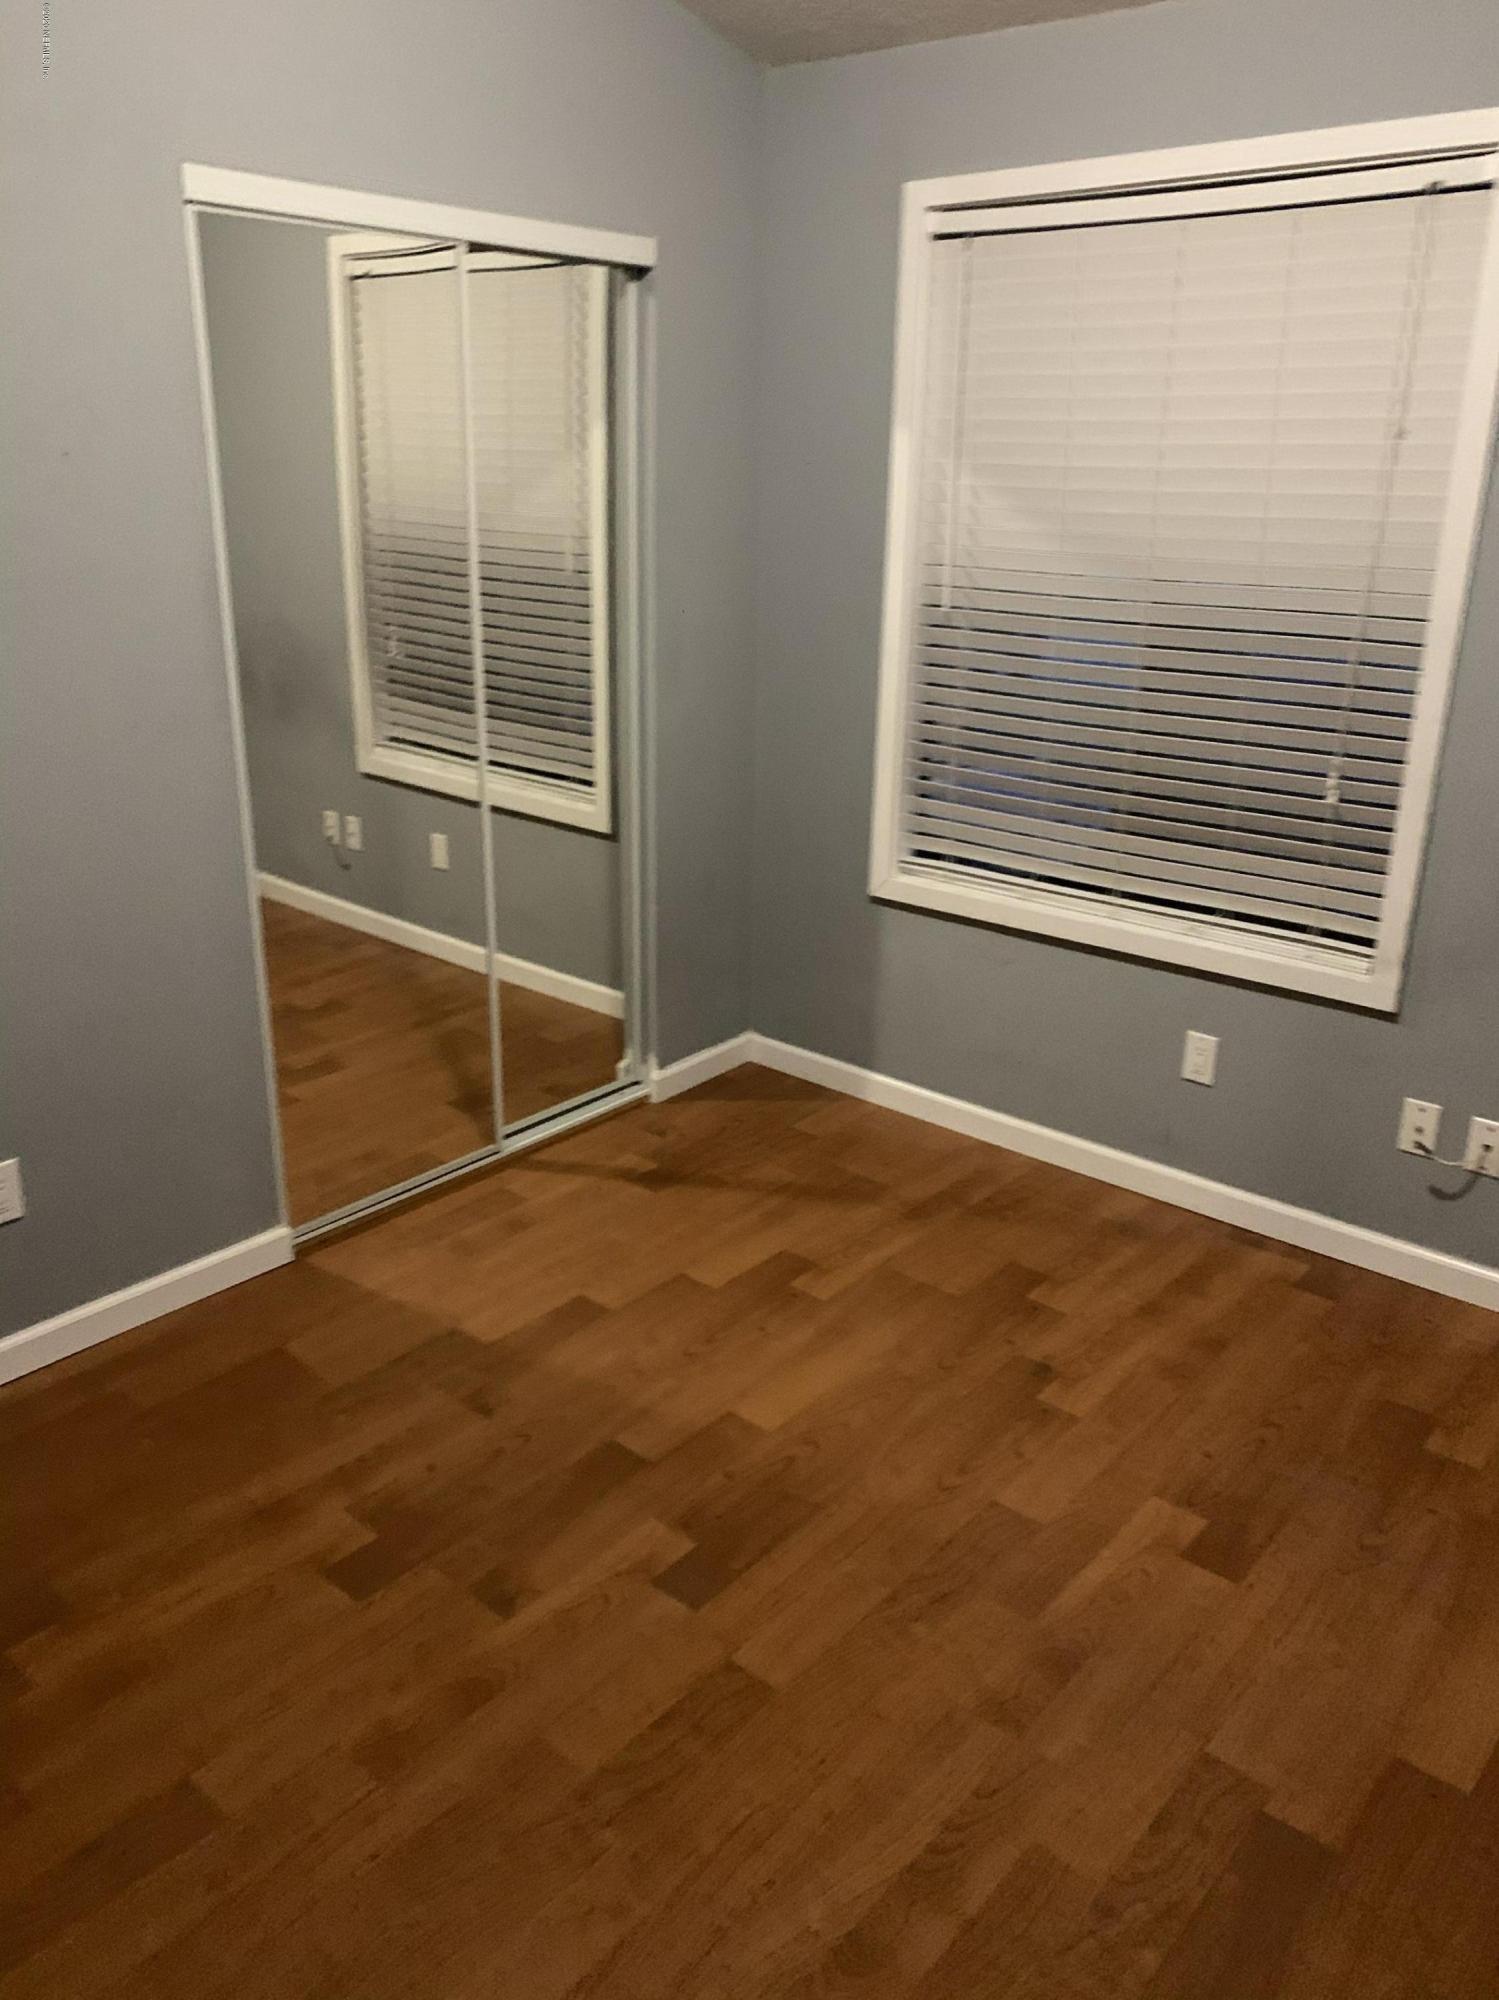 2460 SEABURY, JACKSONVILLE, FLORIDA 32246, 2 Bedrooms Bedrooms, ,1 BathroomBathrooms,Residential,For sale,SEABURY,1056620